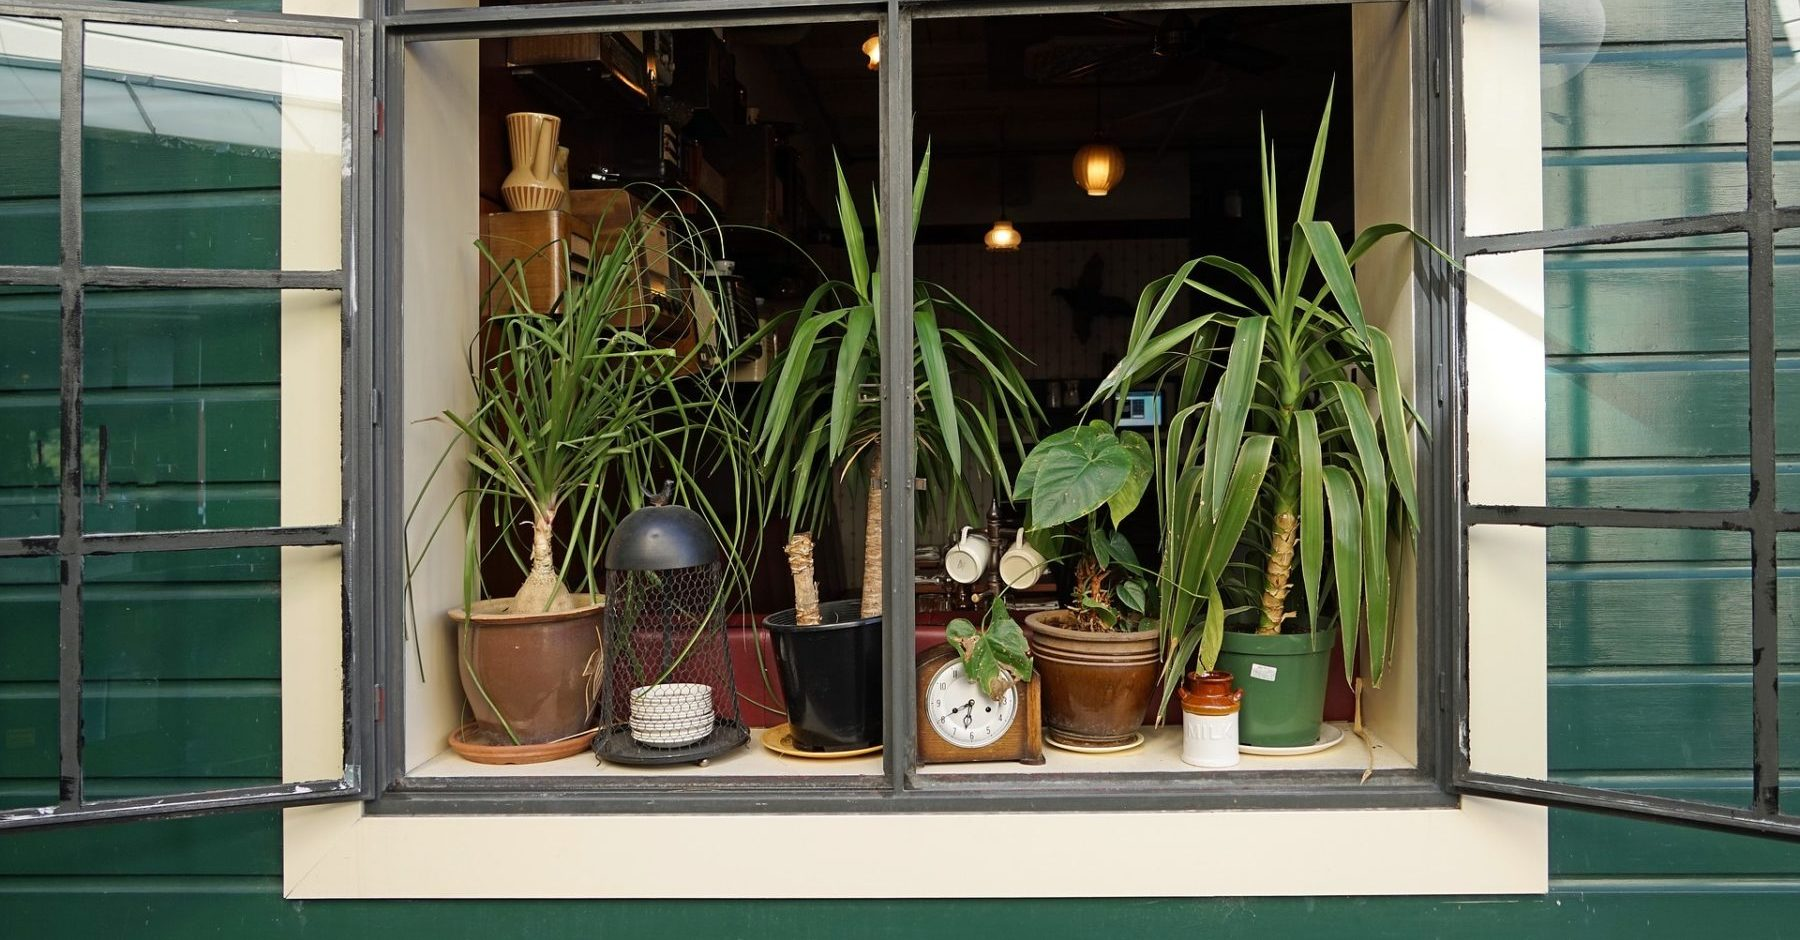 Grüne Zimmerpflanzen am Fensterbrett